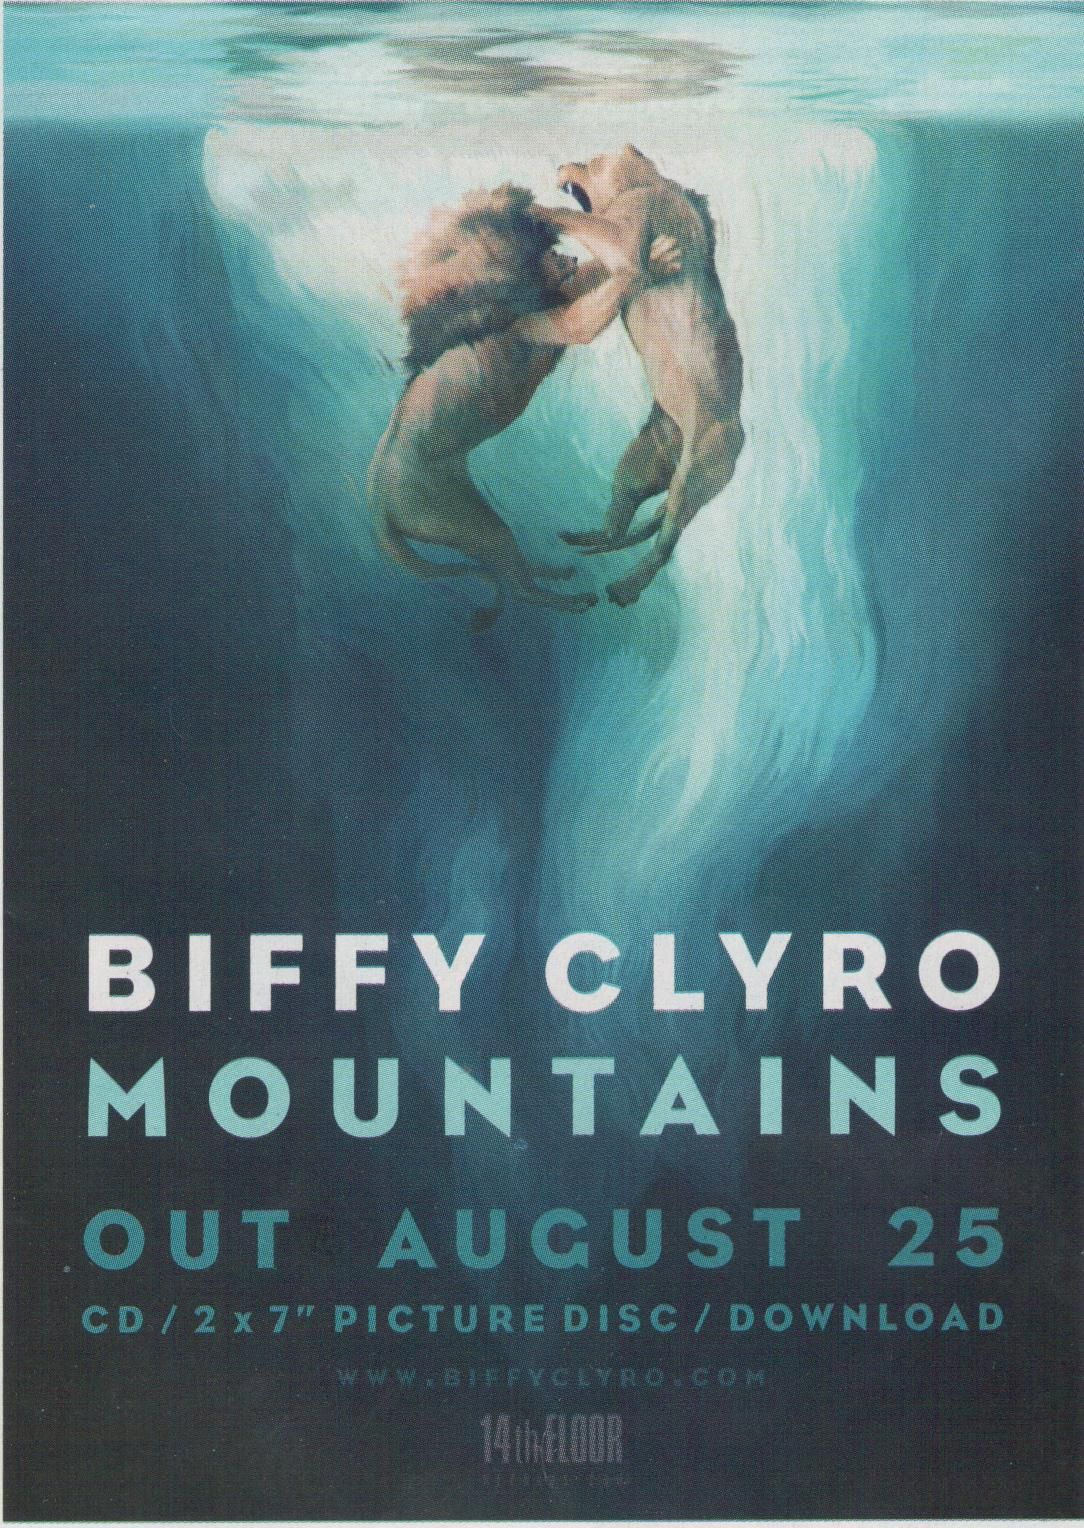 BIFFY CLYRO - MOUNTAINS LYRICS - SONGLYRICS.com